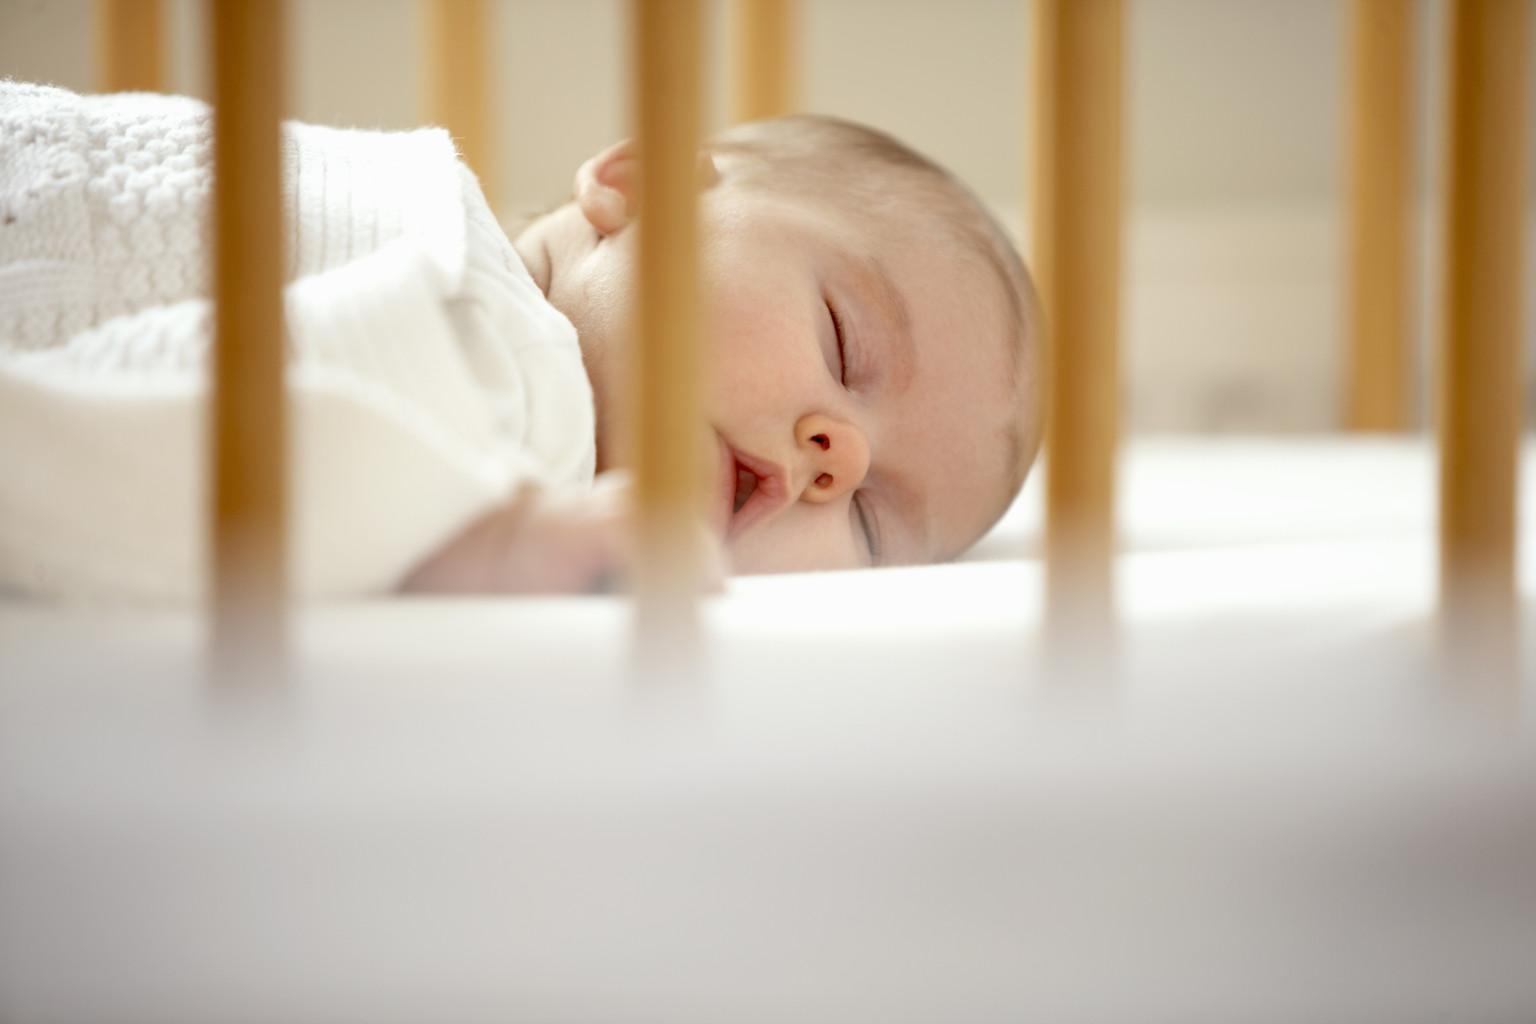 baby-sleeping-in-crib-motherhoodcare